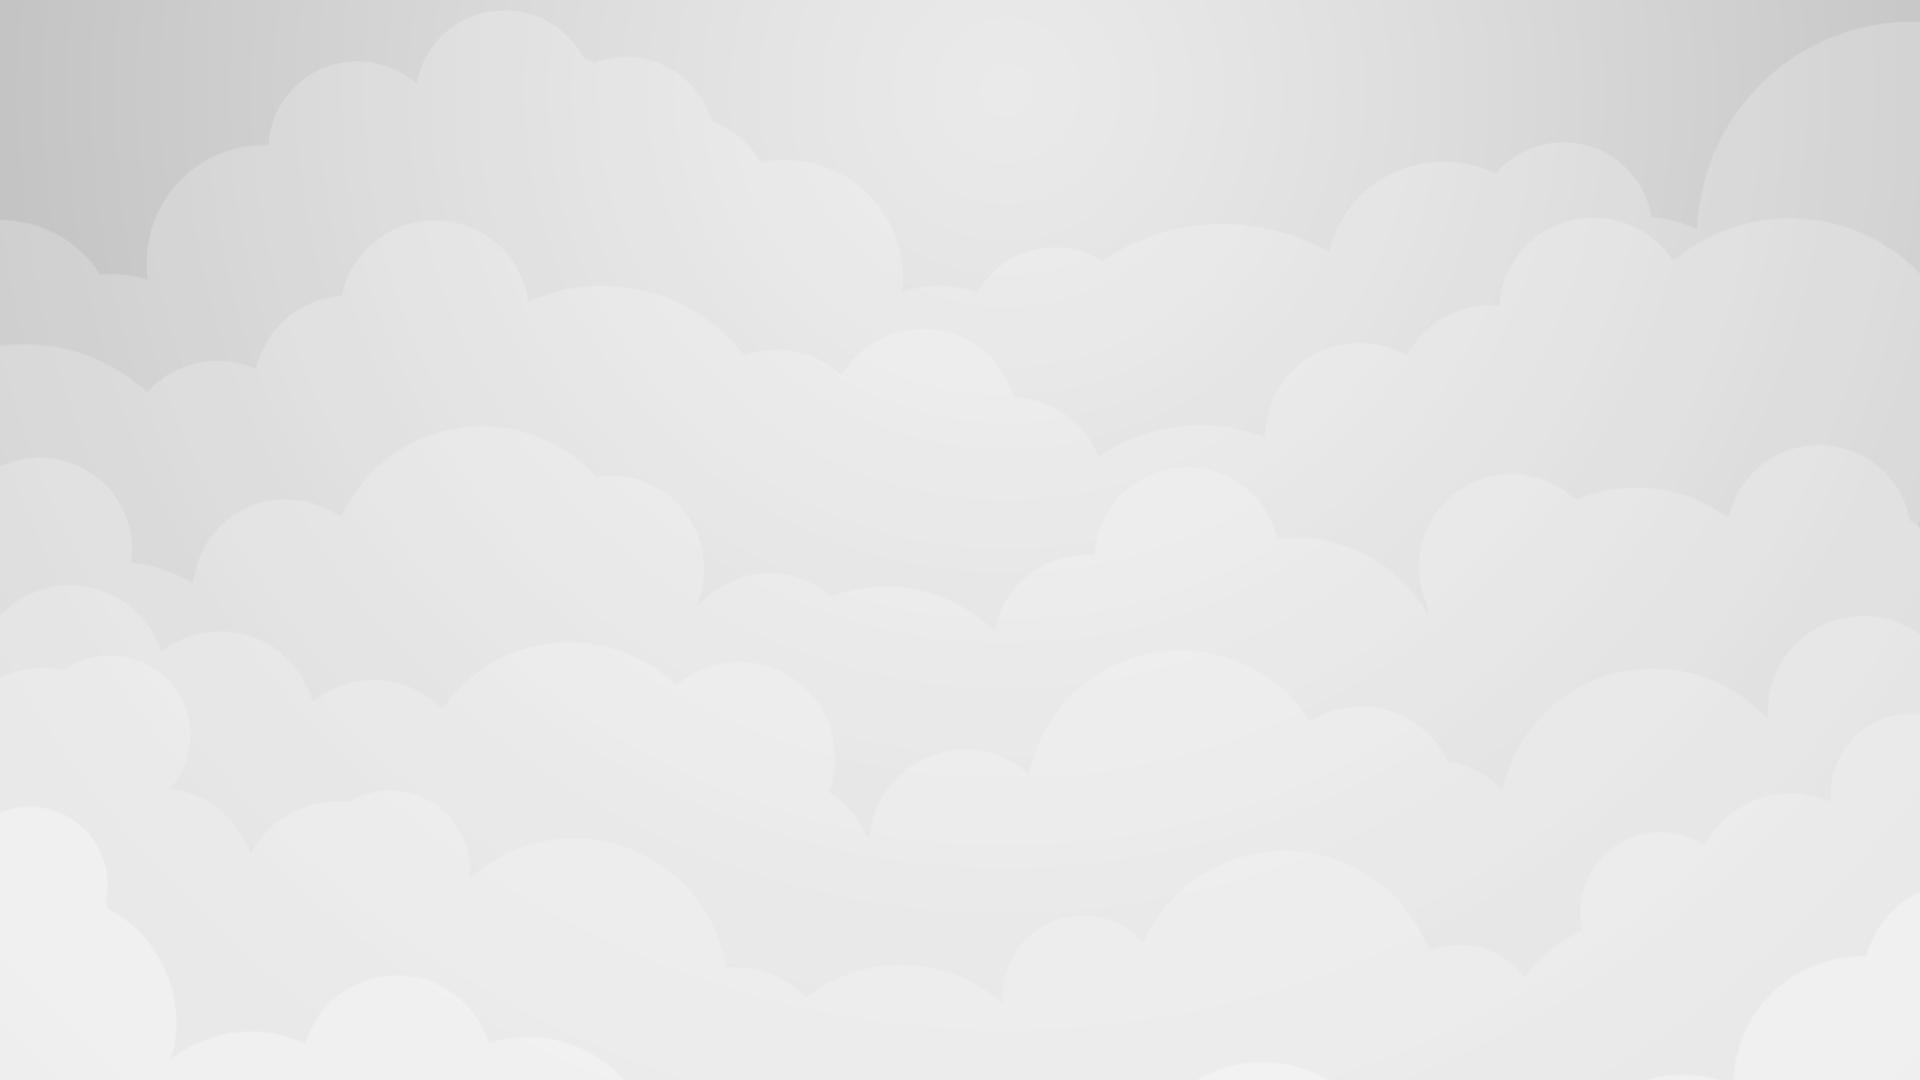 Clouds wallpaper   142504 1920x1080